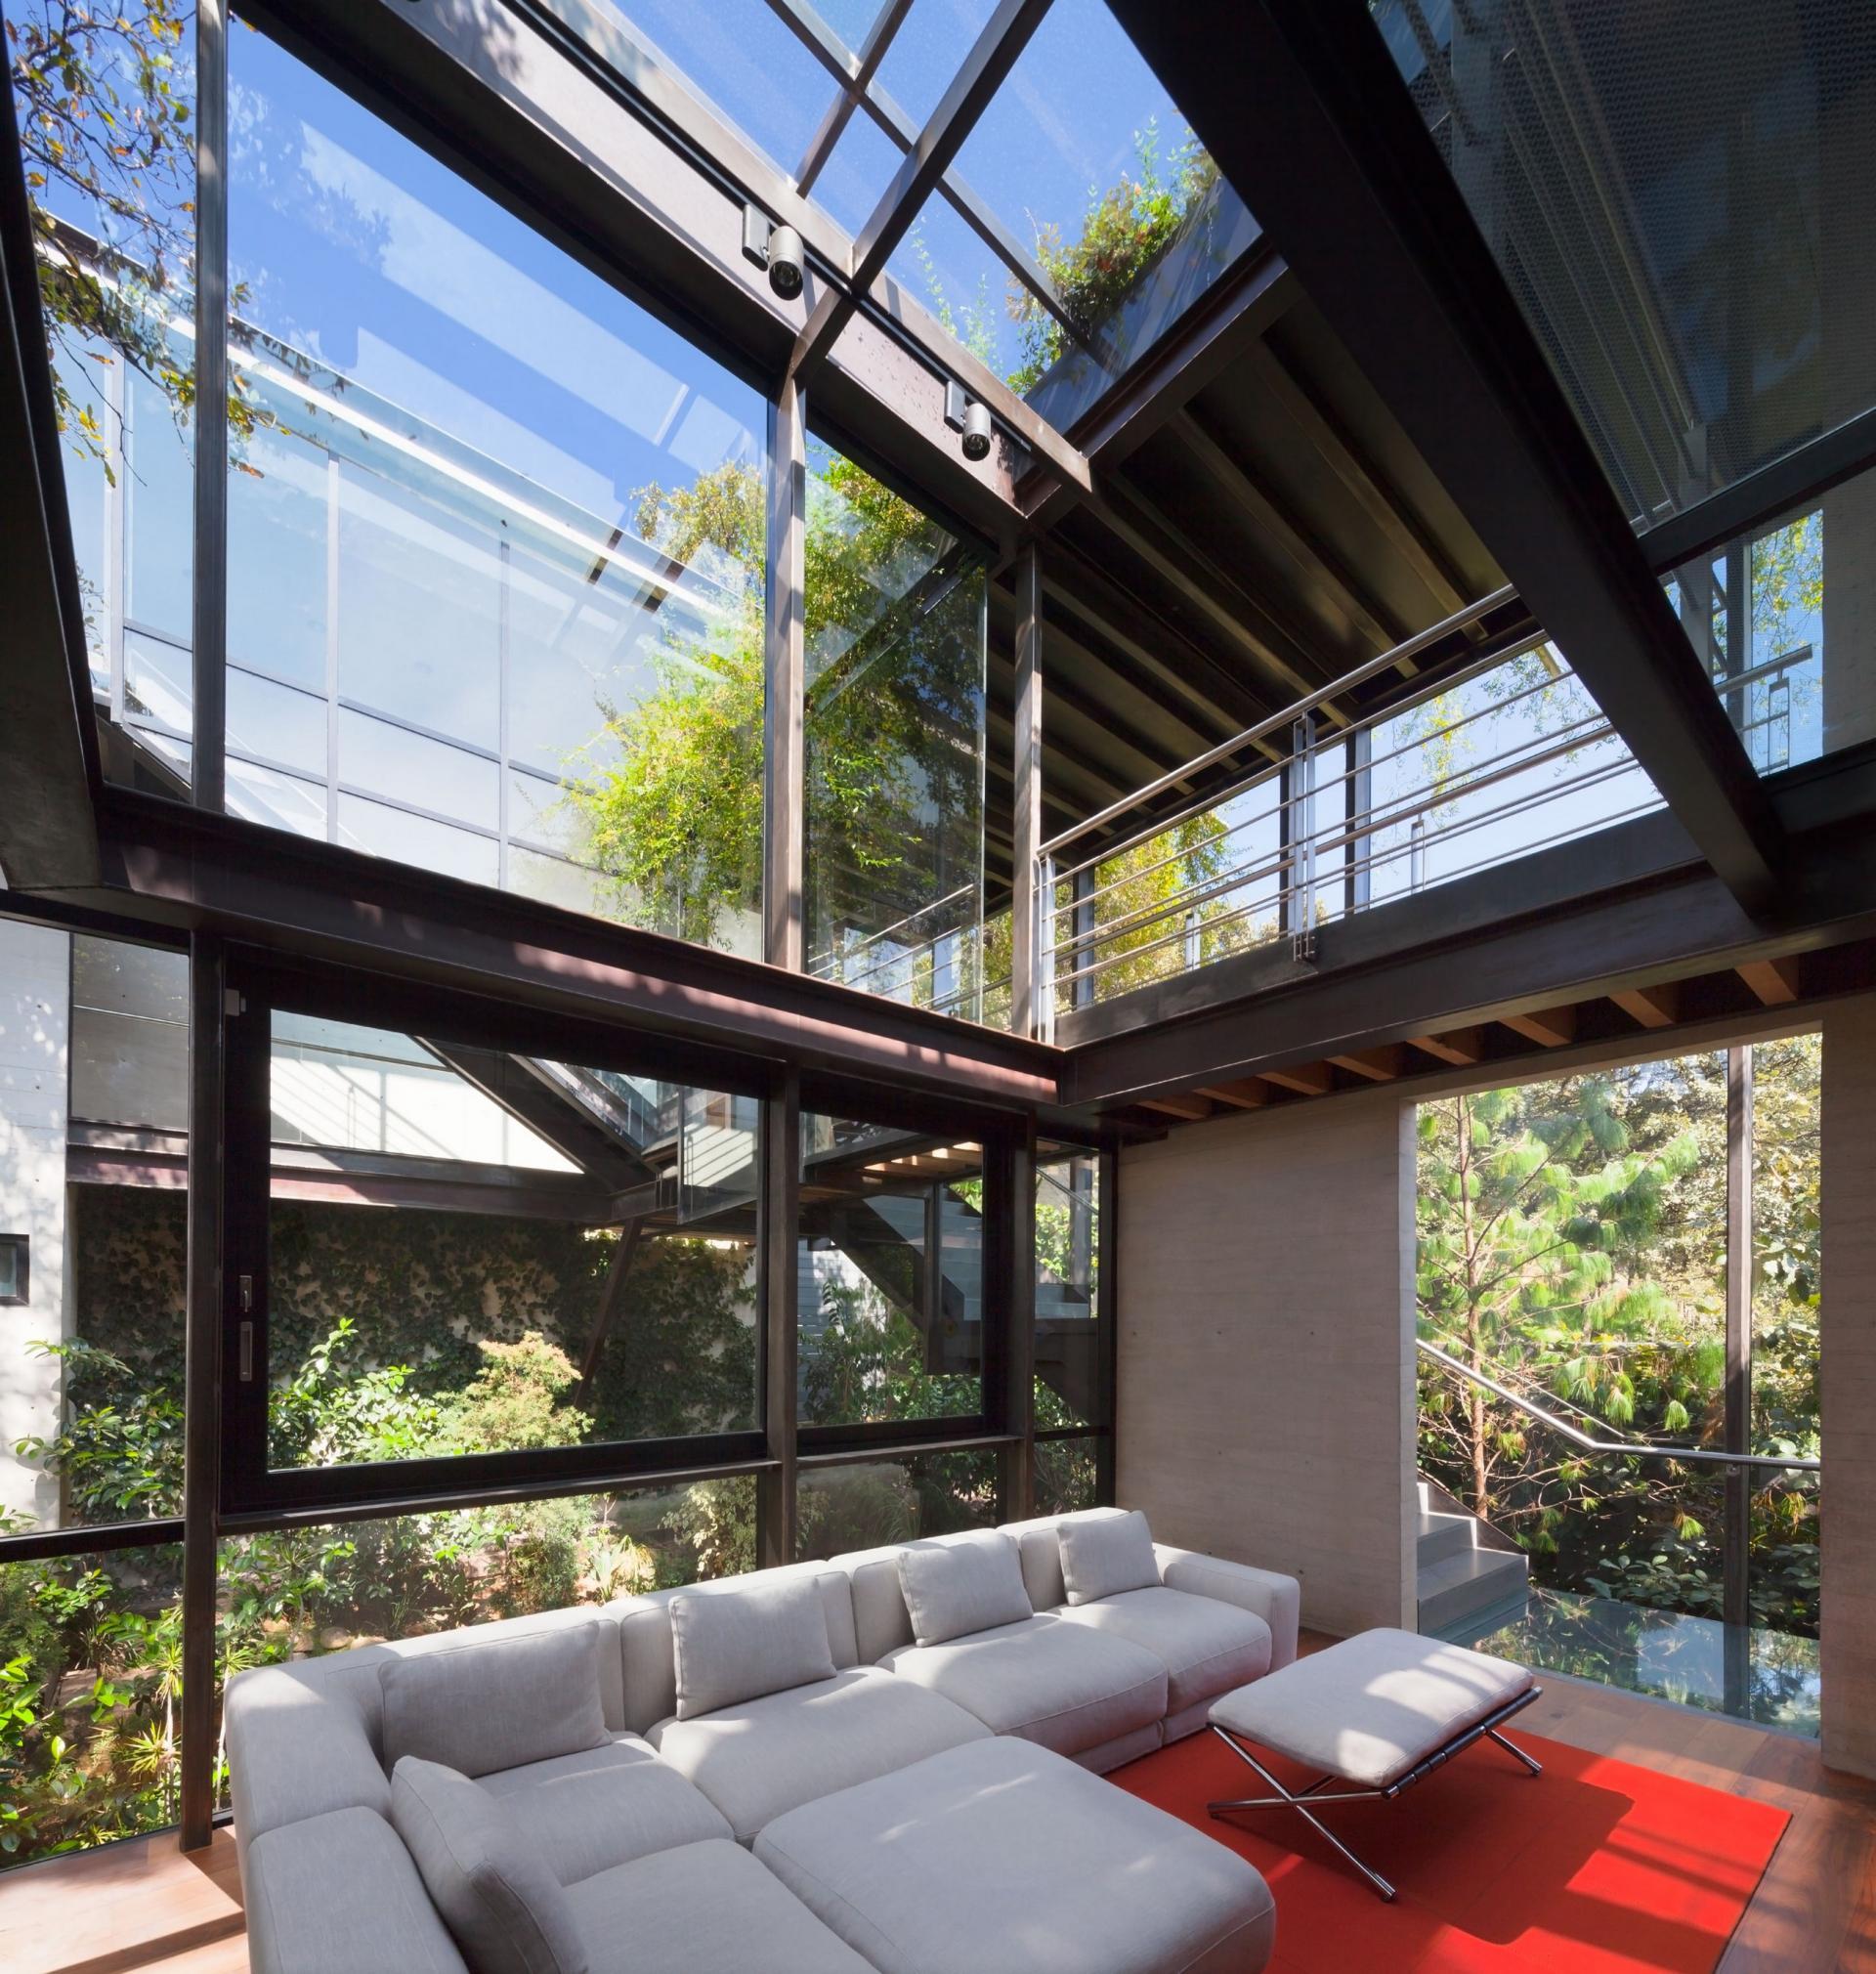 Casa Tepozcuautla - the living room